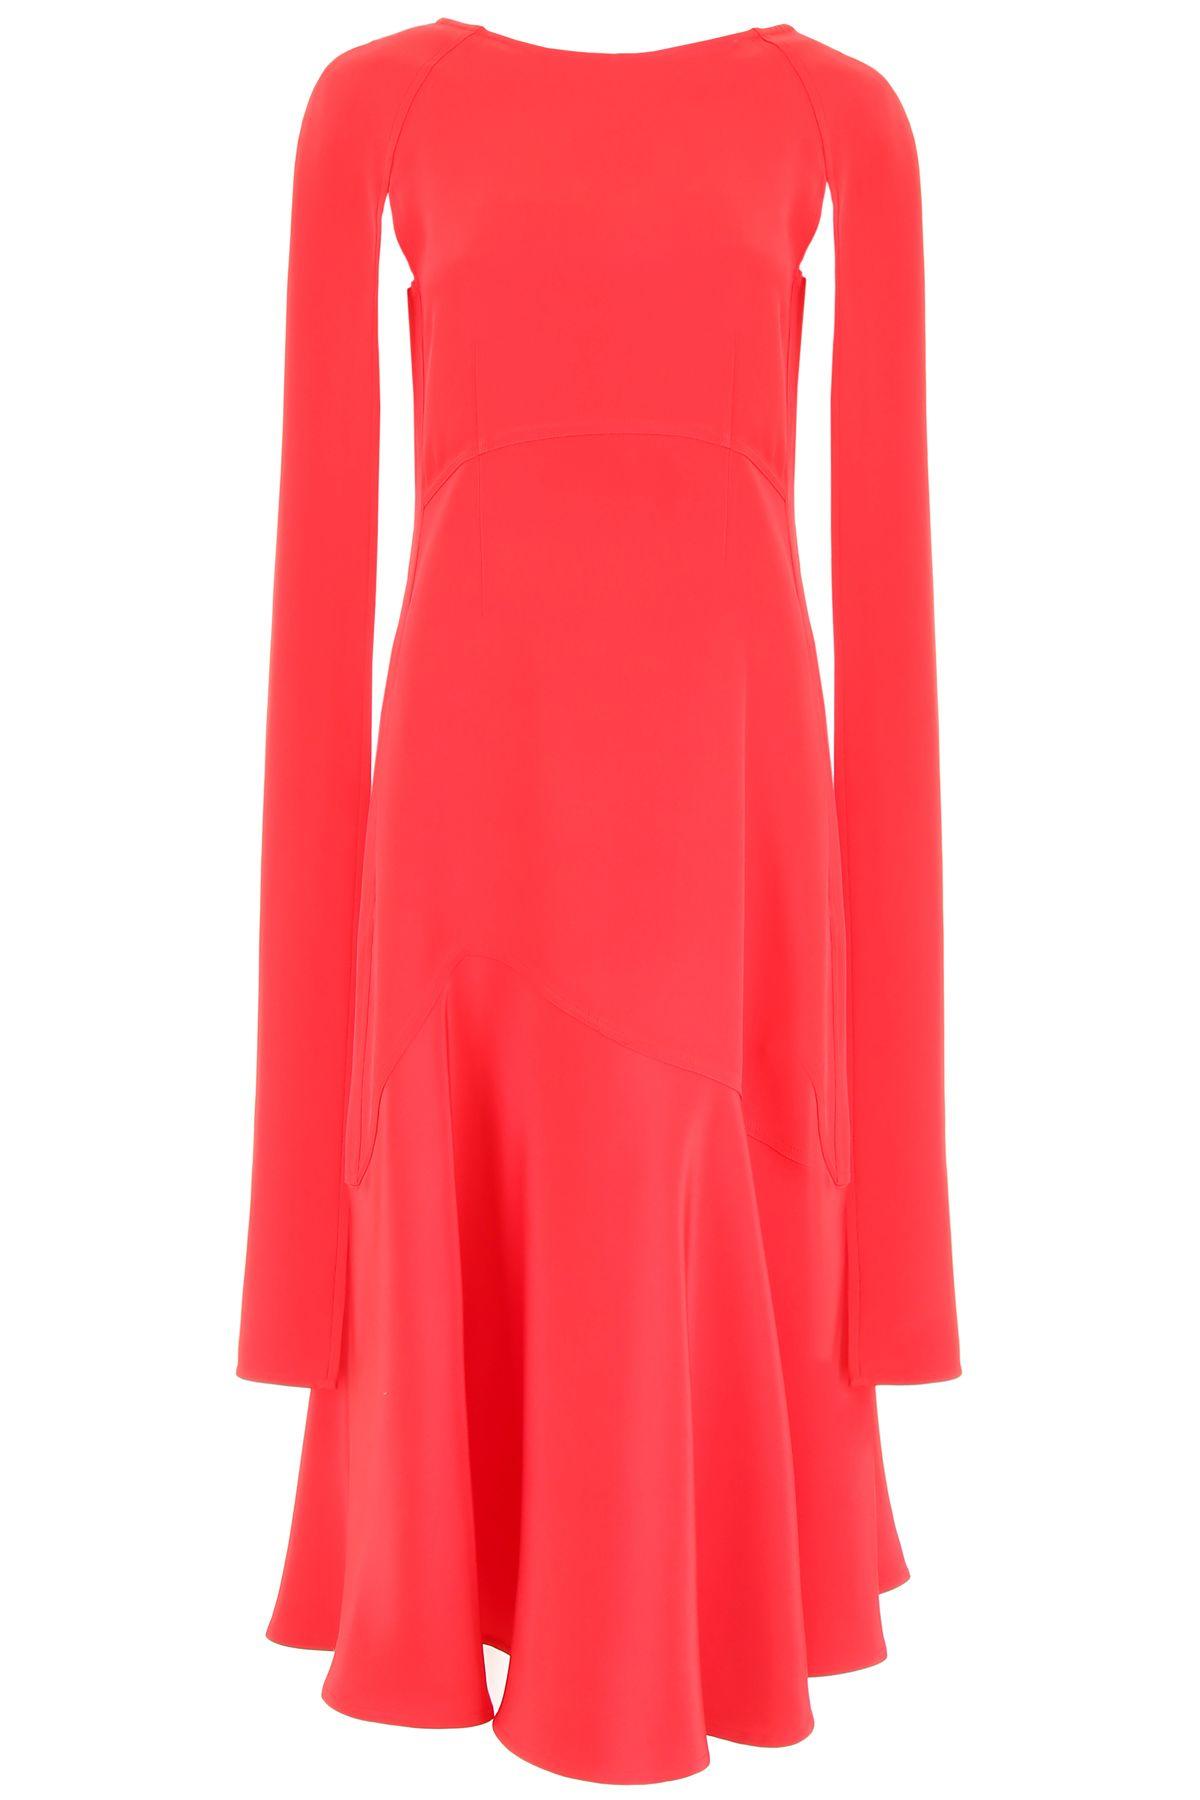 072e5a30afa Calvin Klein Calvin Klein Long Dress With Open Sleeves - RED PINK ...